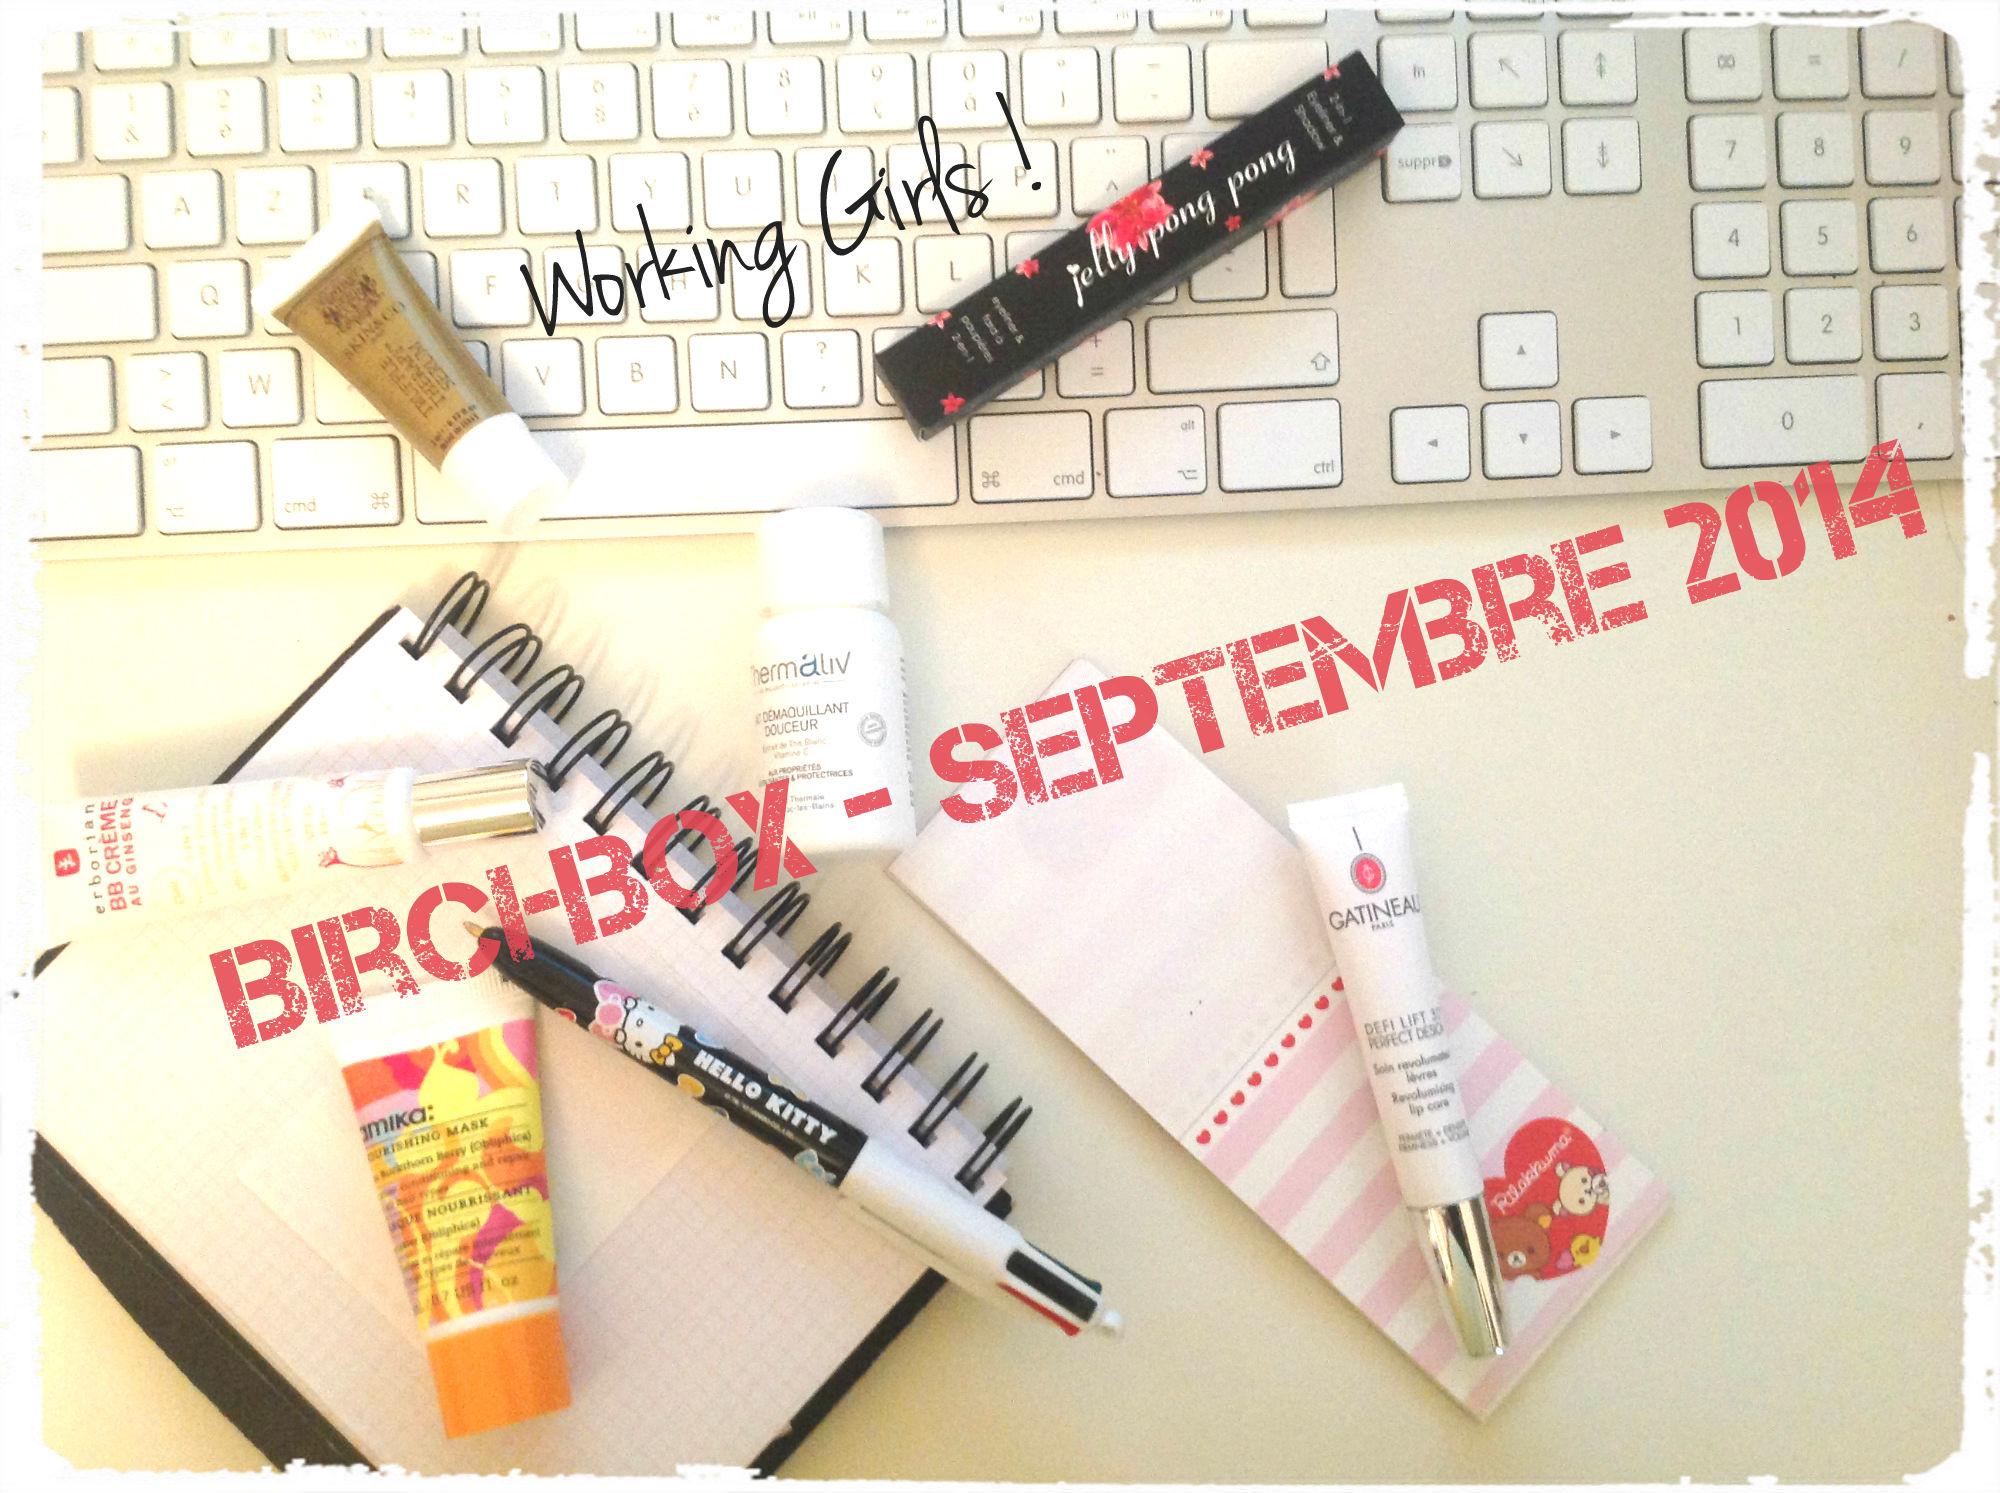 birchbox-septembre-2014-contenu-avis-test-working-girls